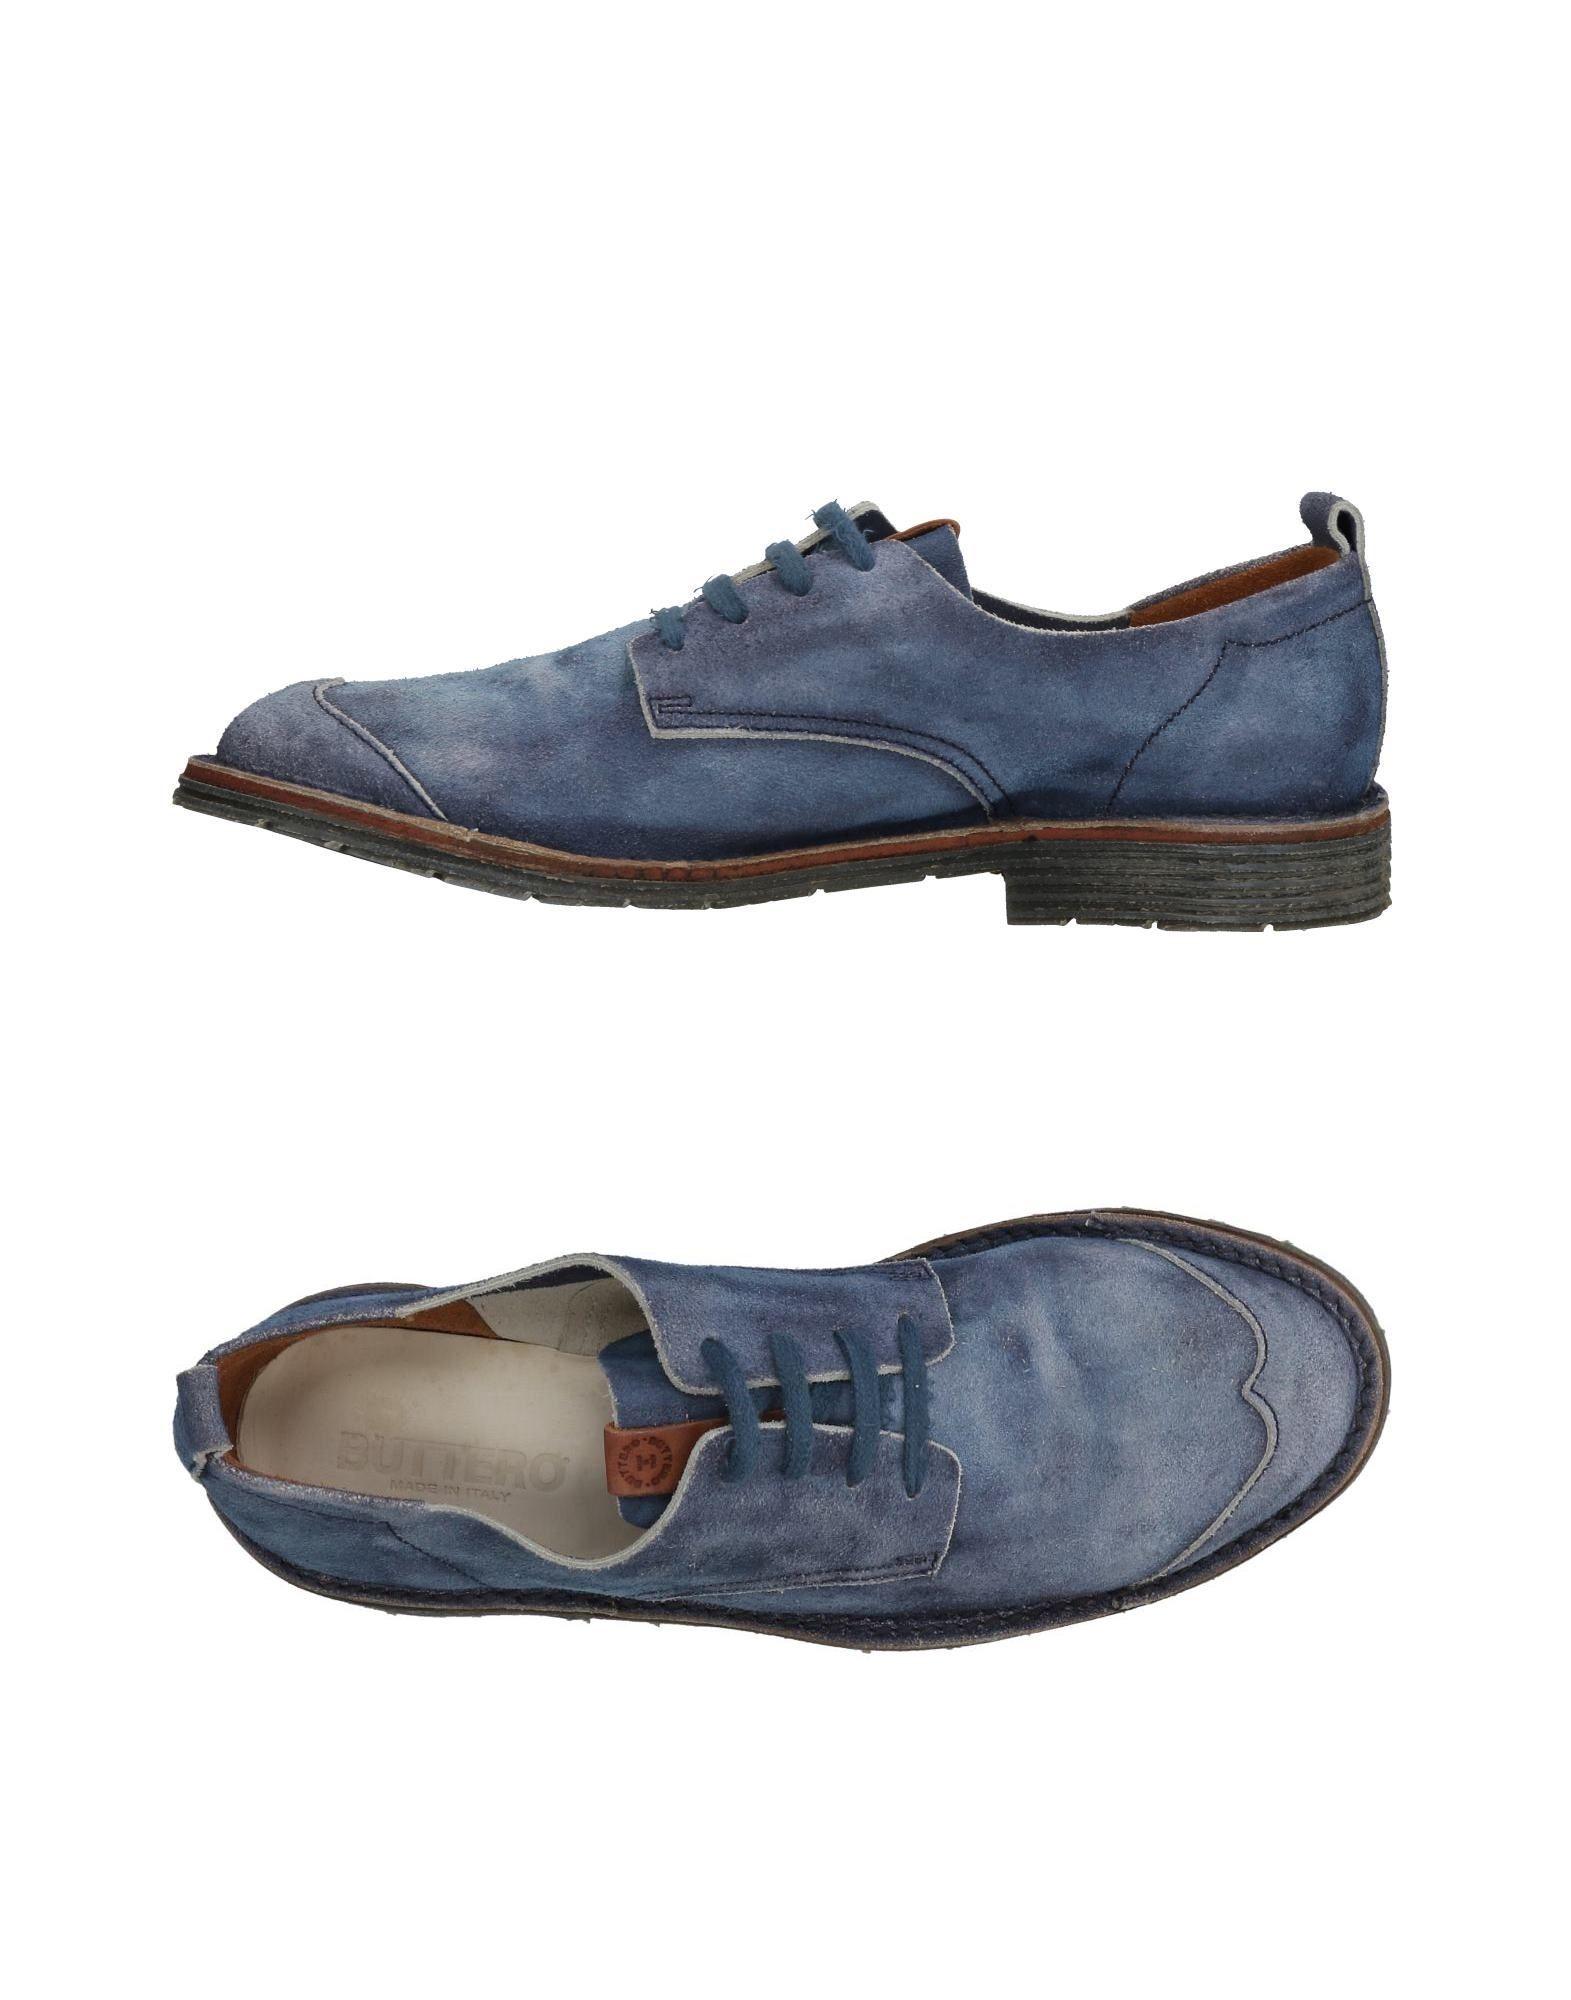 Buttero® Schnürschuhe Herren  11459719PS Gute Qualität beliebte Schuhe